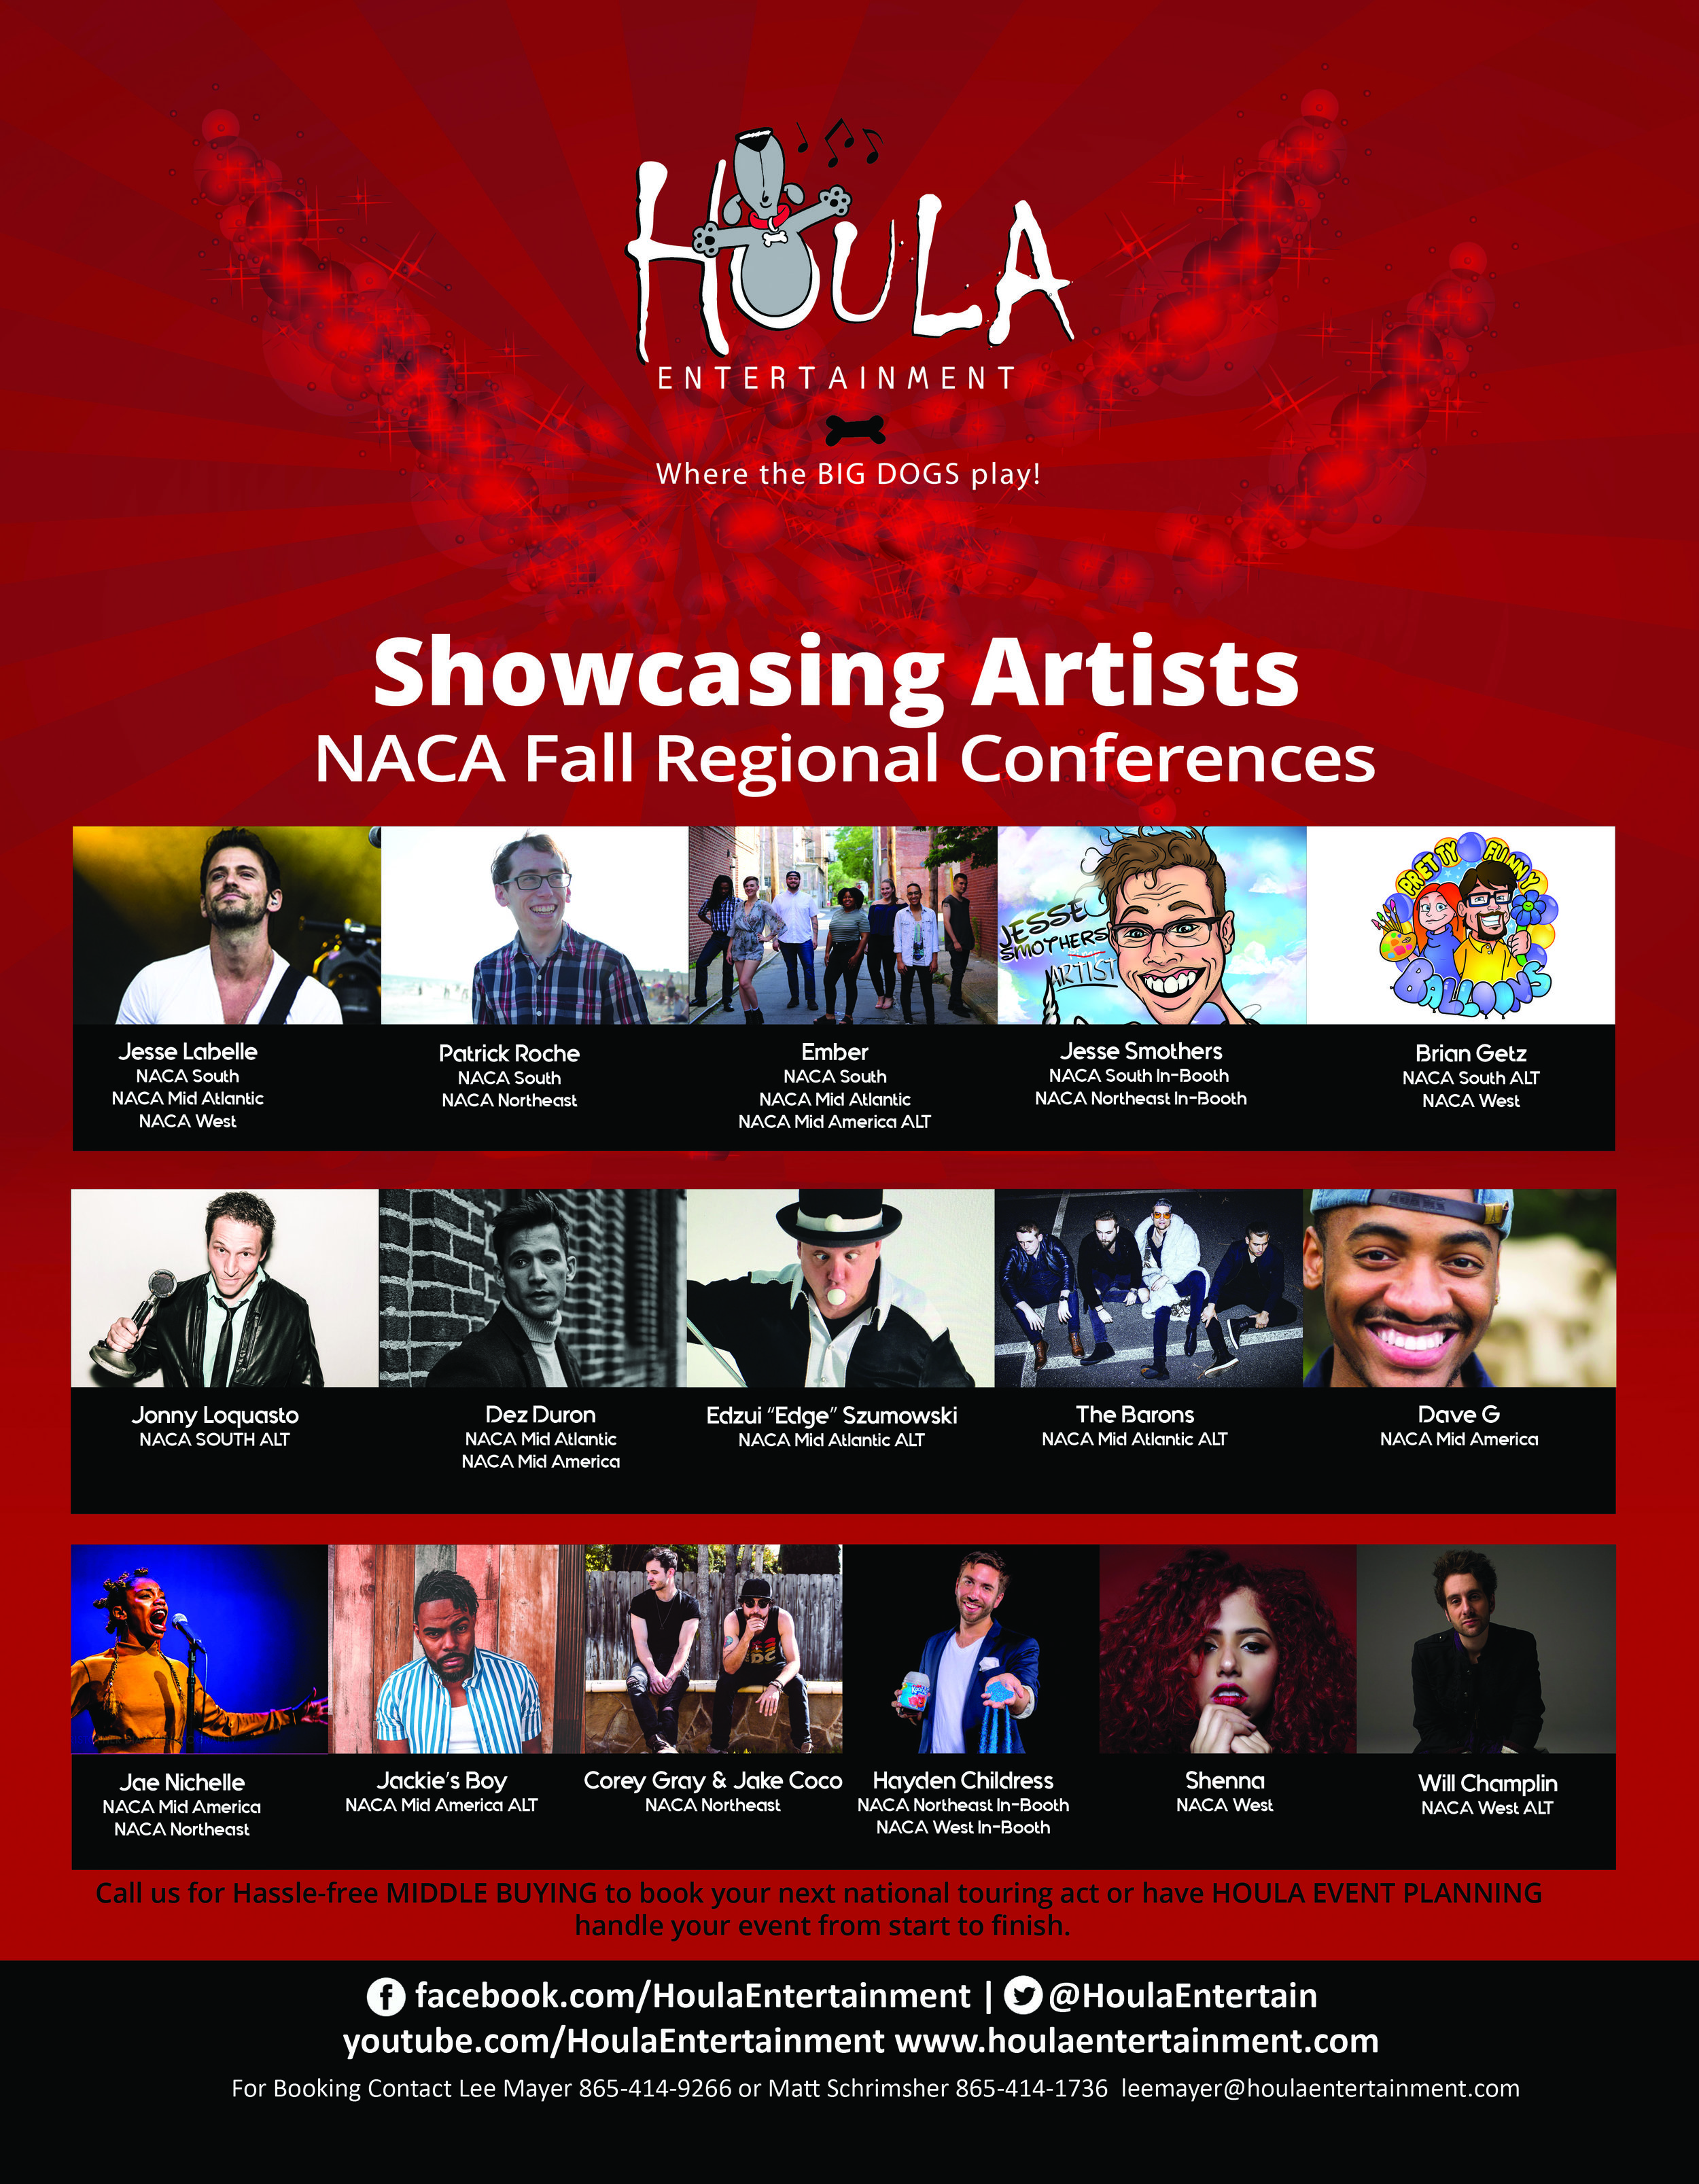 NACA 2018 Fall Showcasing Artists